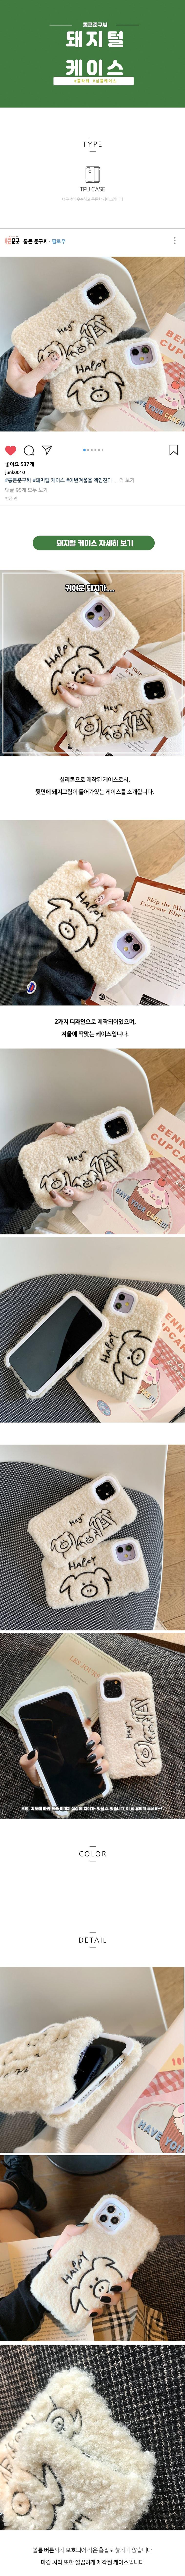 Pig hair case